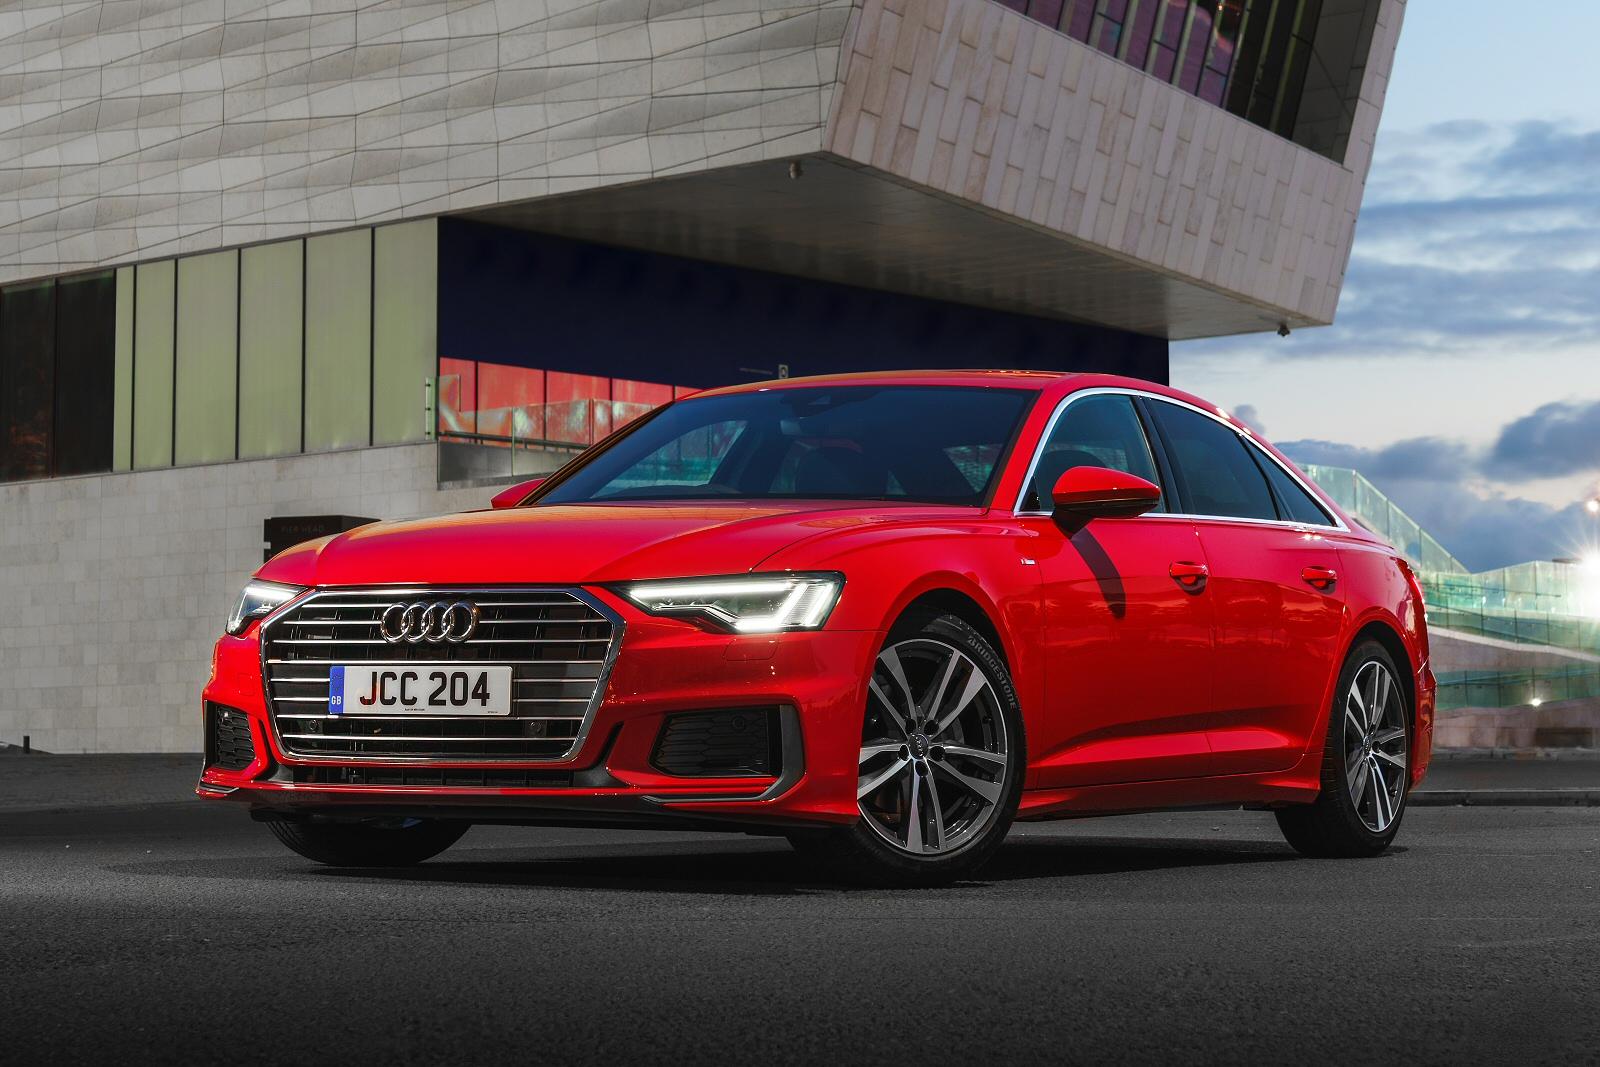 Audi A6 40 Tfsi Sport 4dr S Tronic